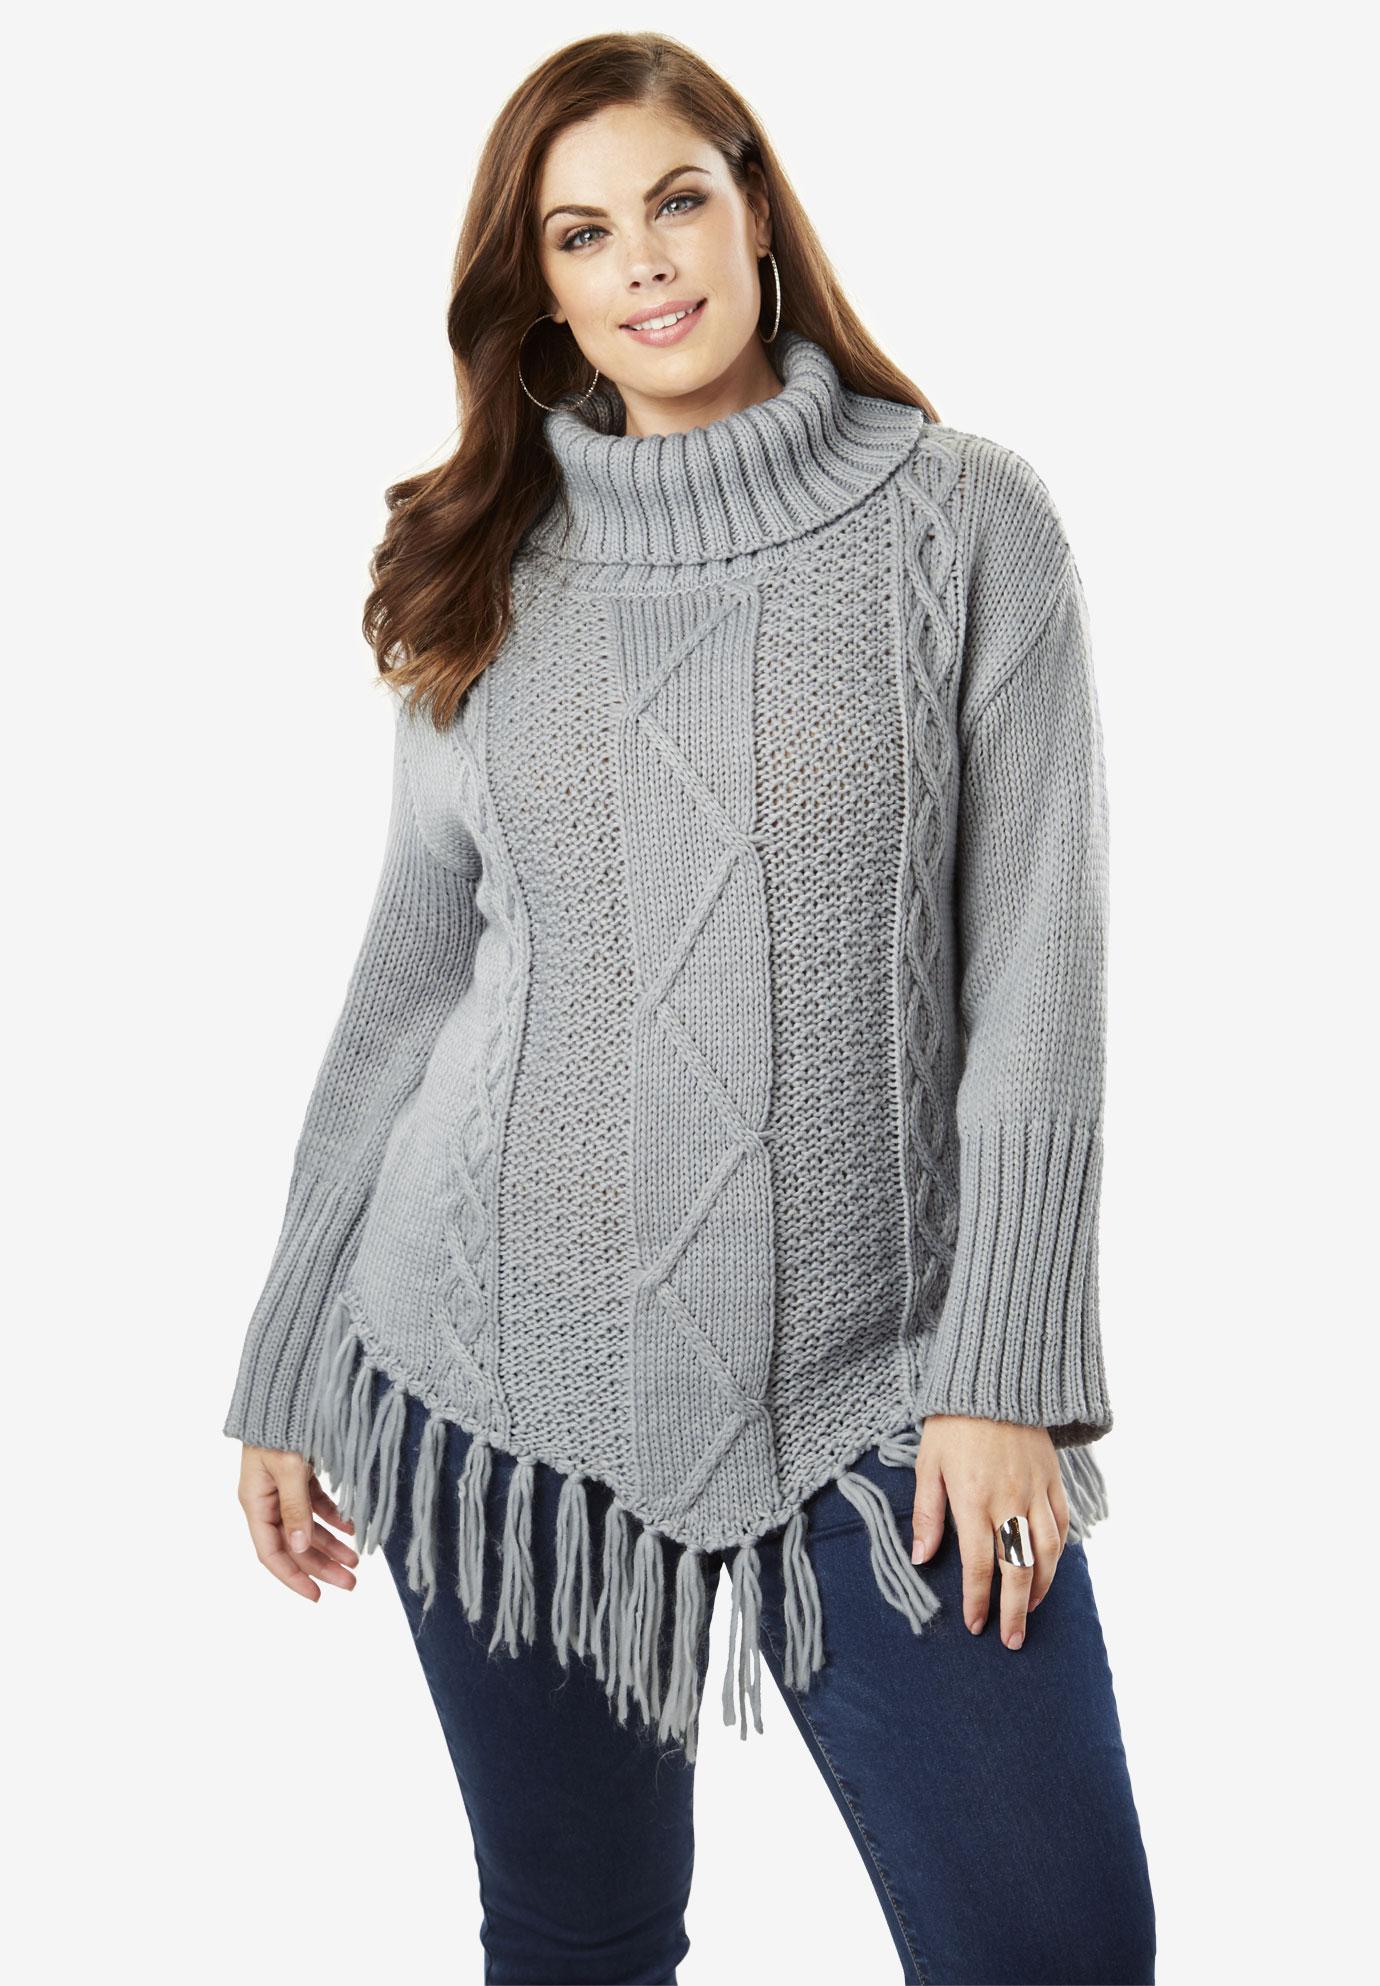 2e8f35f1e5f0a Cowlneck Cableknit Sweater with Fringe Hem